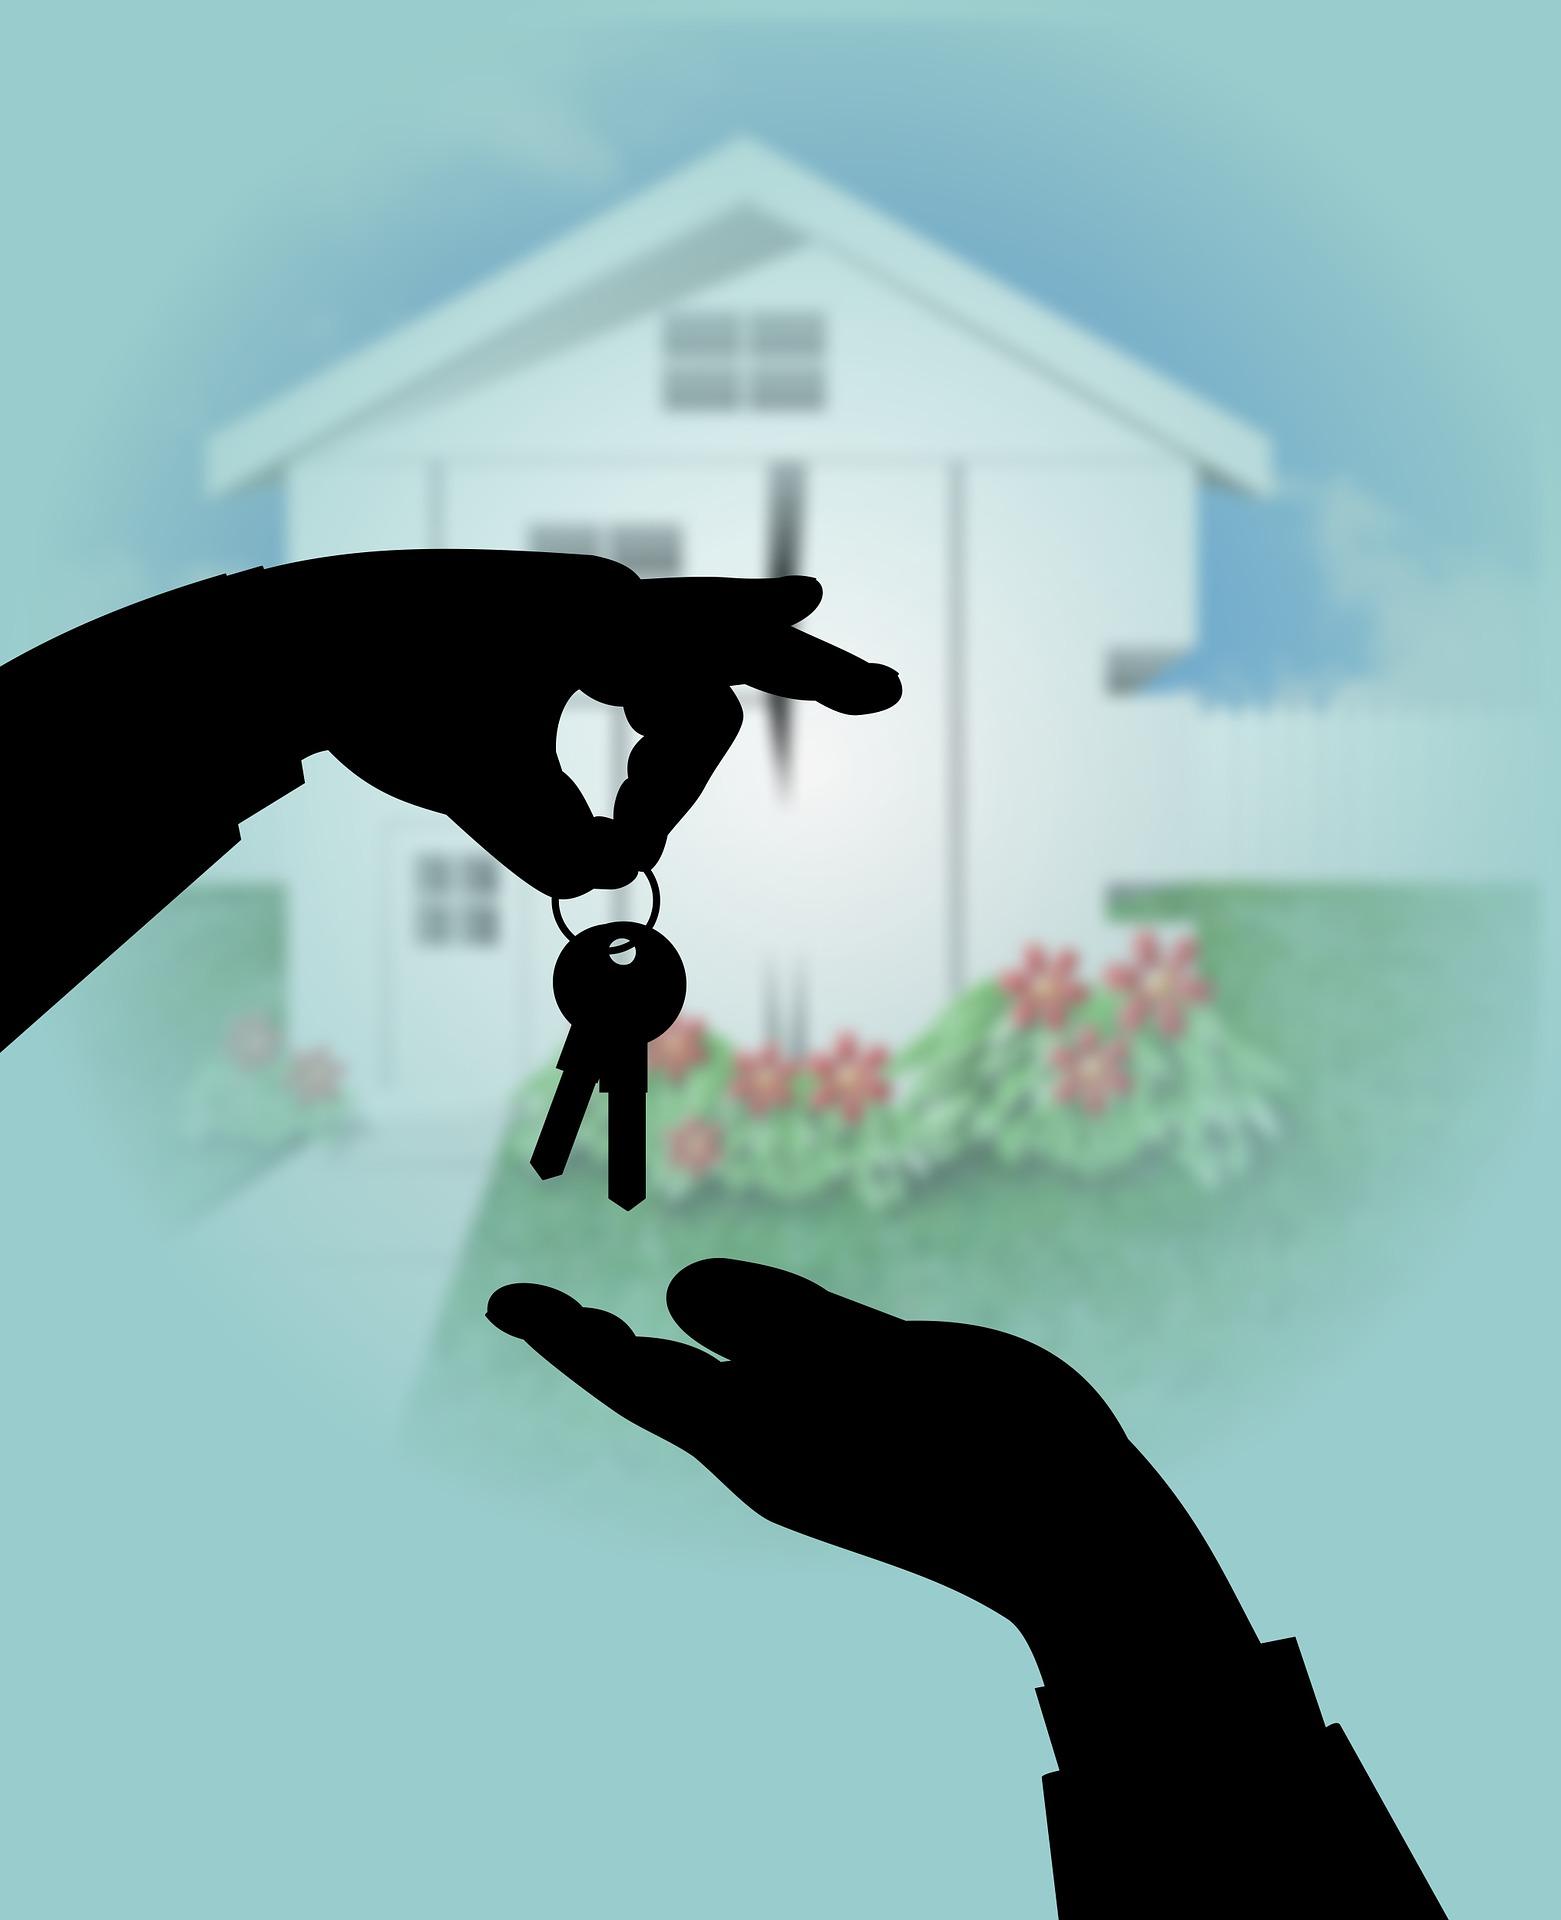 reasons to buy a home in 2018.jpg